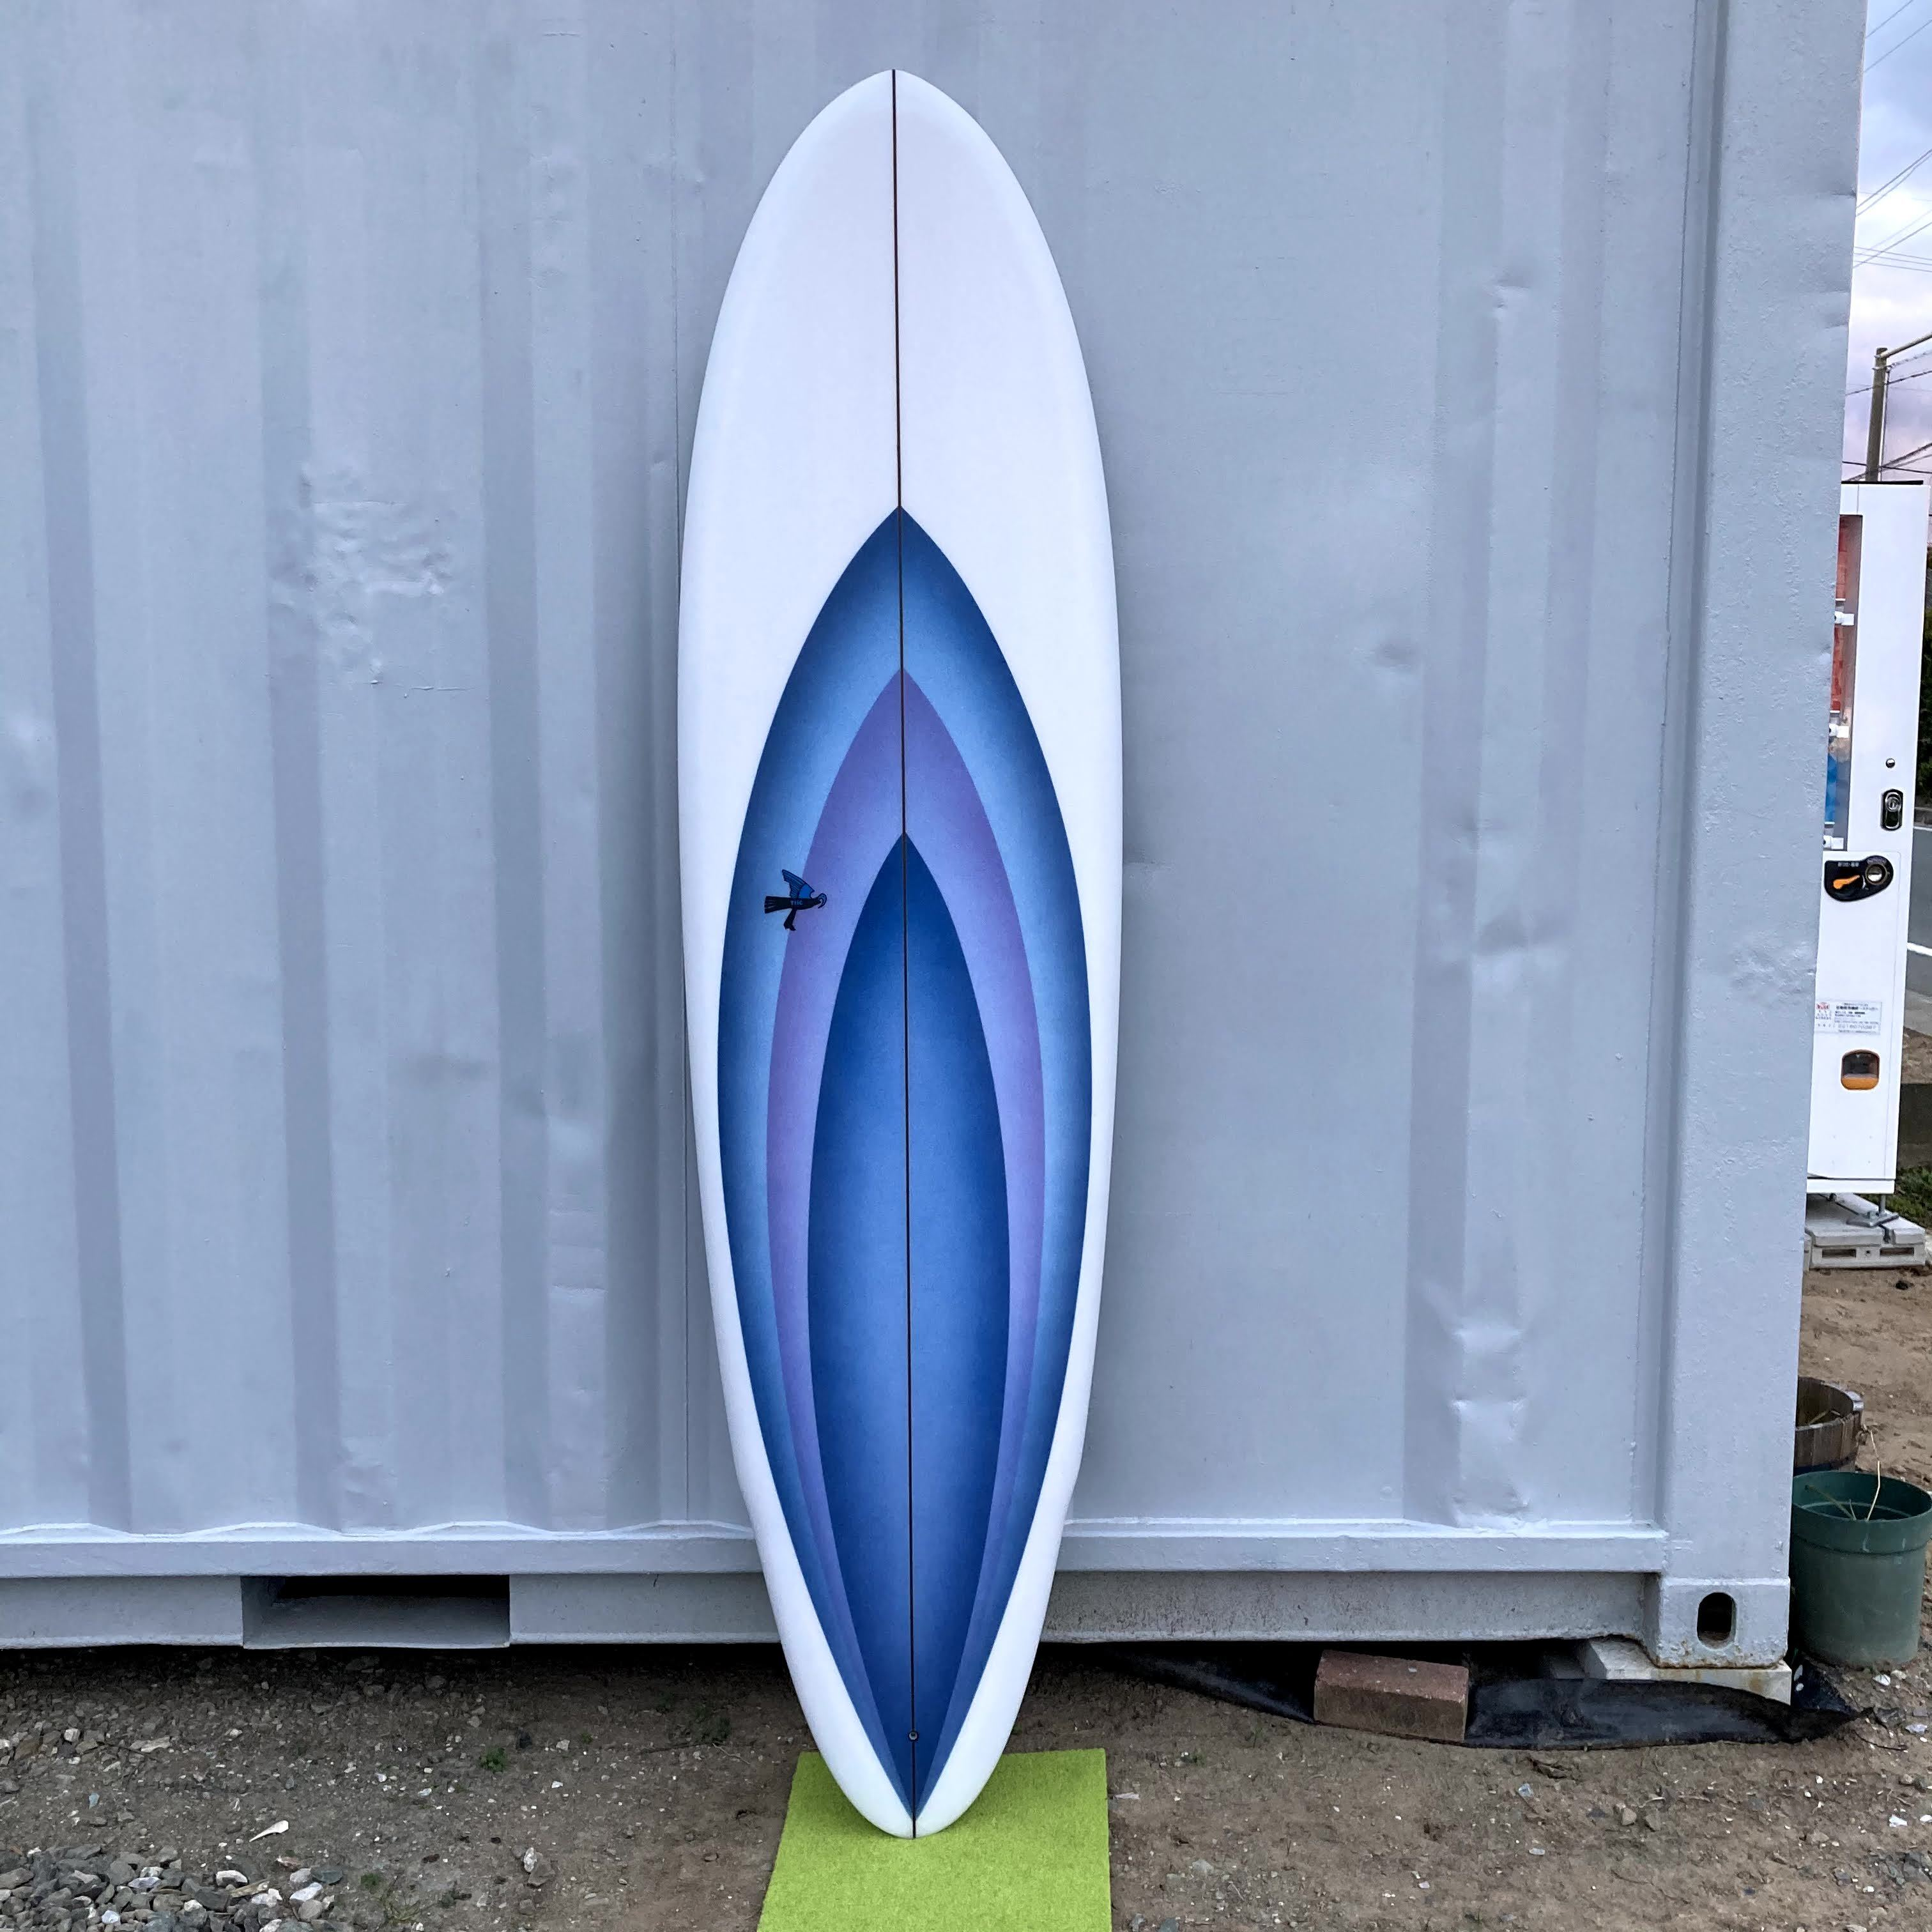 【THC SURFBOARDS】THC サーフボード HAWK 7'2-22 1/5-3 1/10